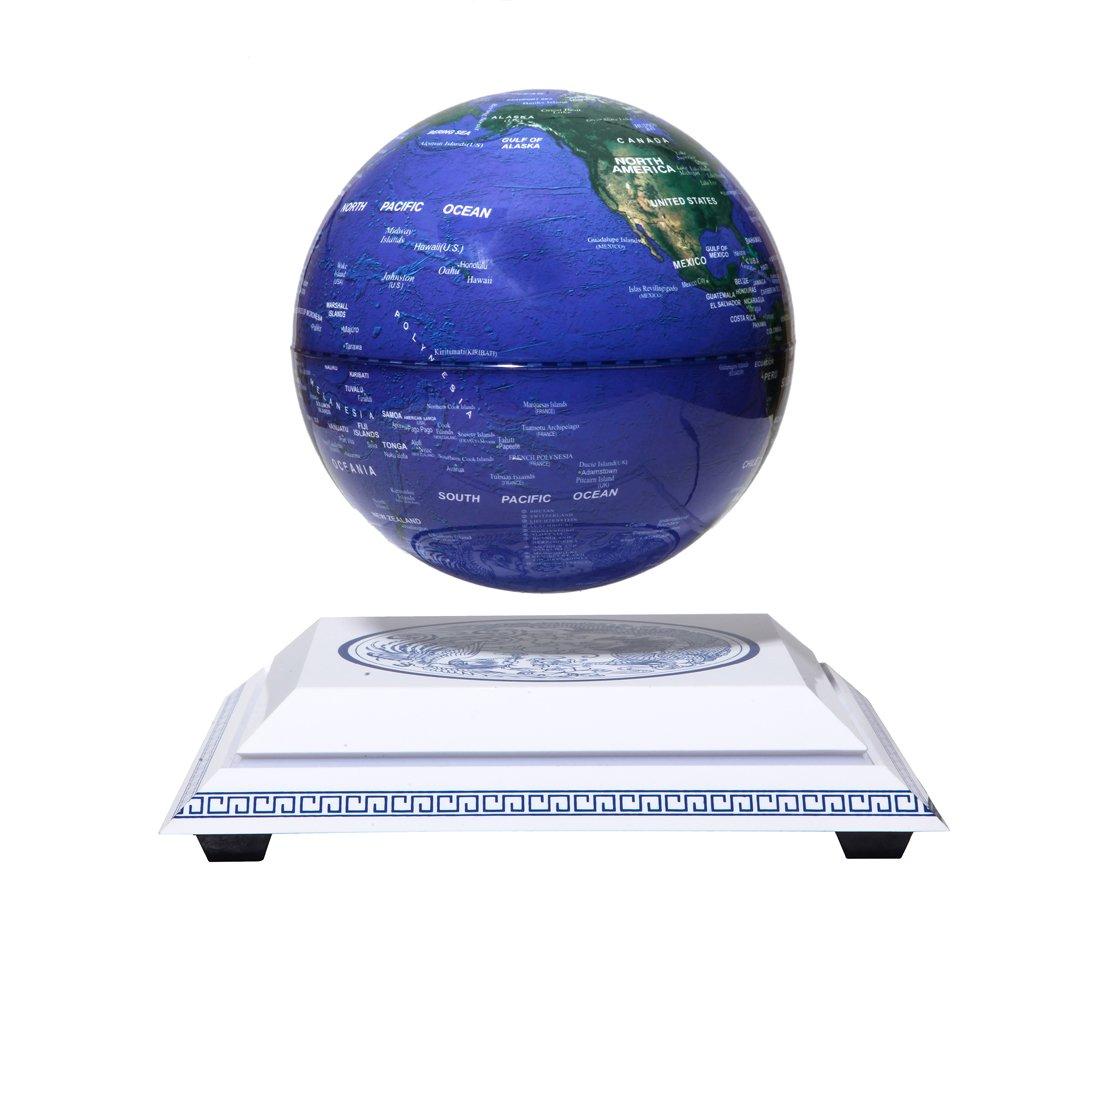 woodlev Maglev Magnetic Levitation Levitron Floating Rotating Wireless Transmission Light itself 6'' Blue Globe Chinoiserie Chinese Style Platform Learning Education Home Decor